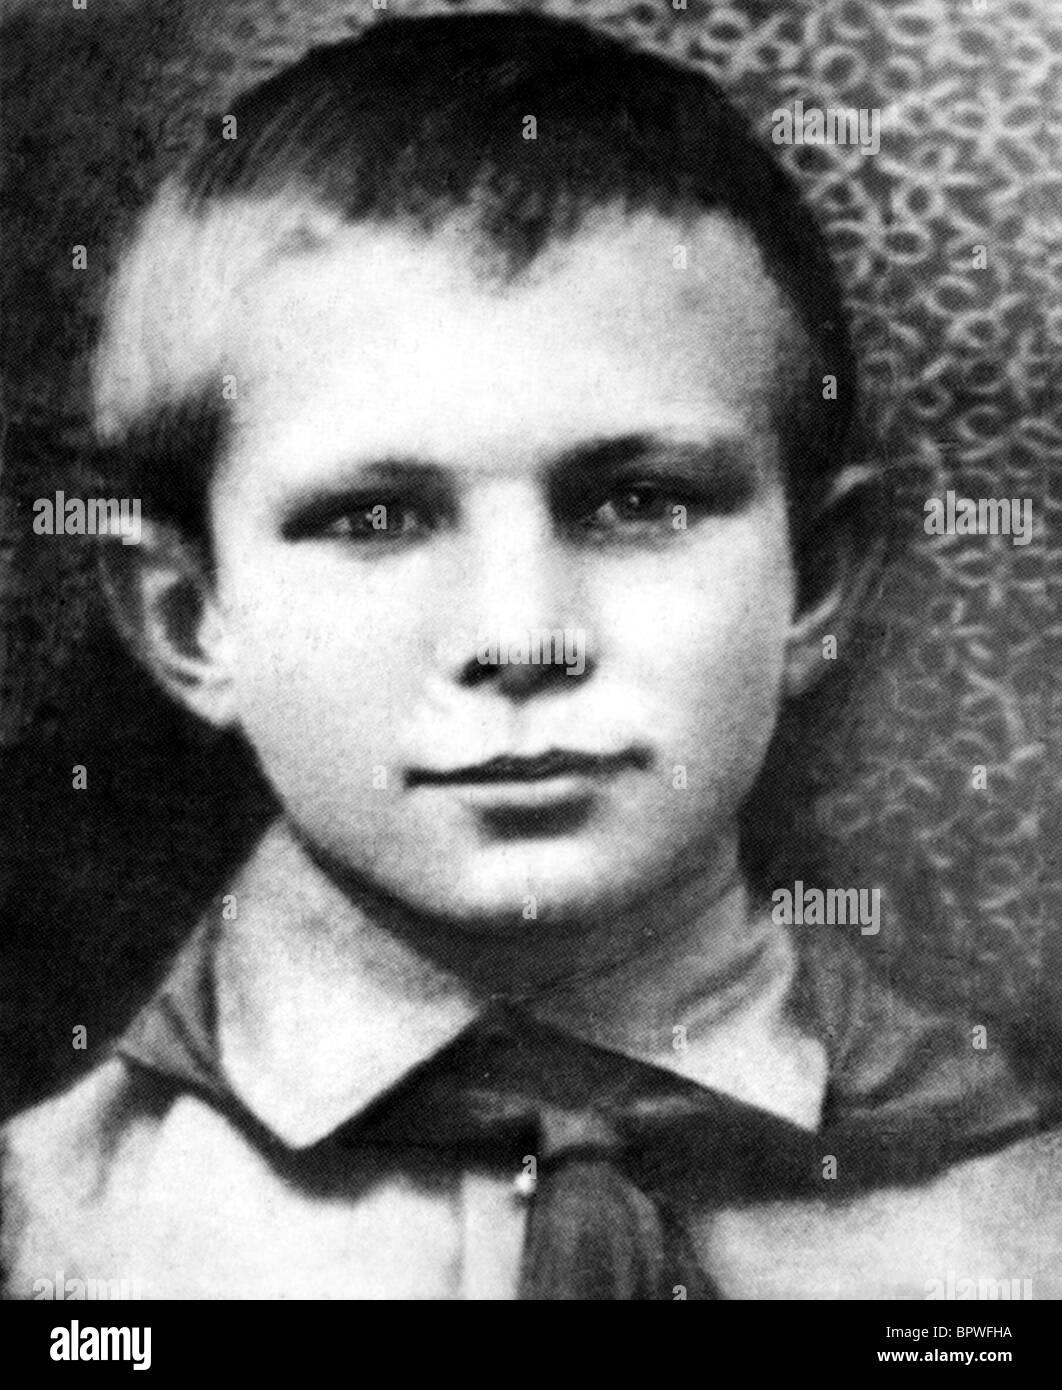 YURI GAGARIN 10 Jahre russische KOSMONAUTEN 16. Januar 1944 Stockbild